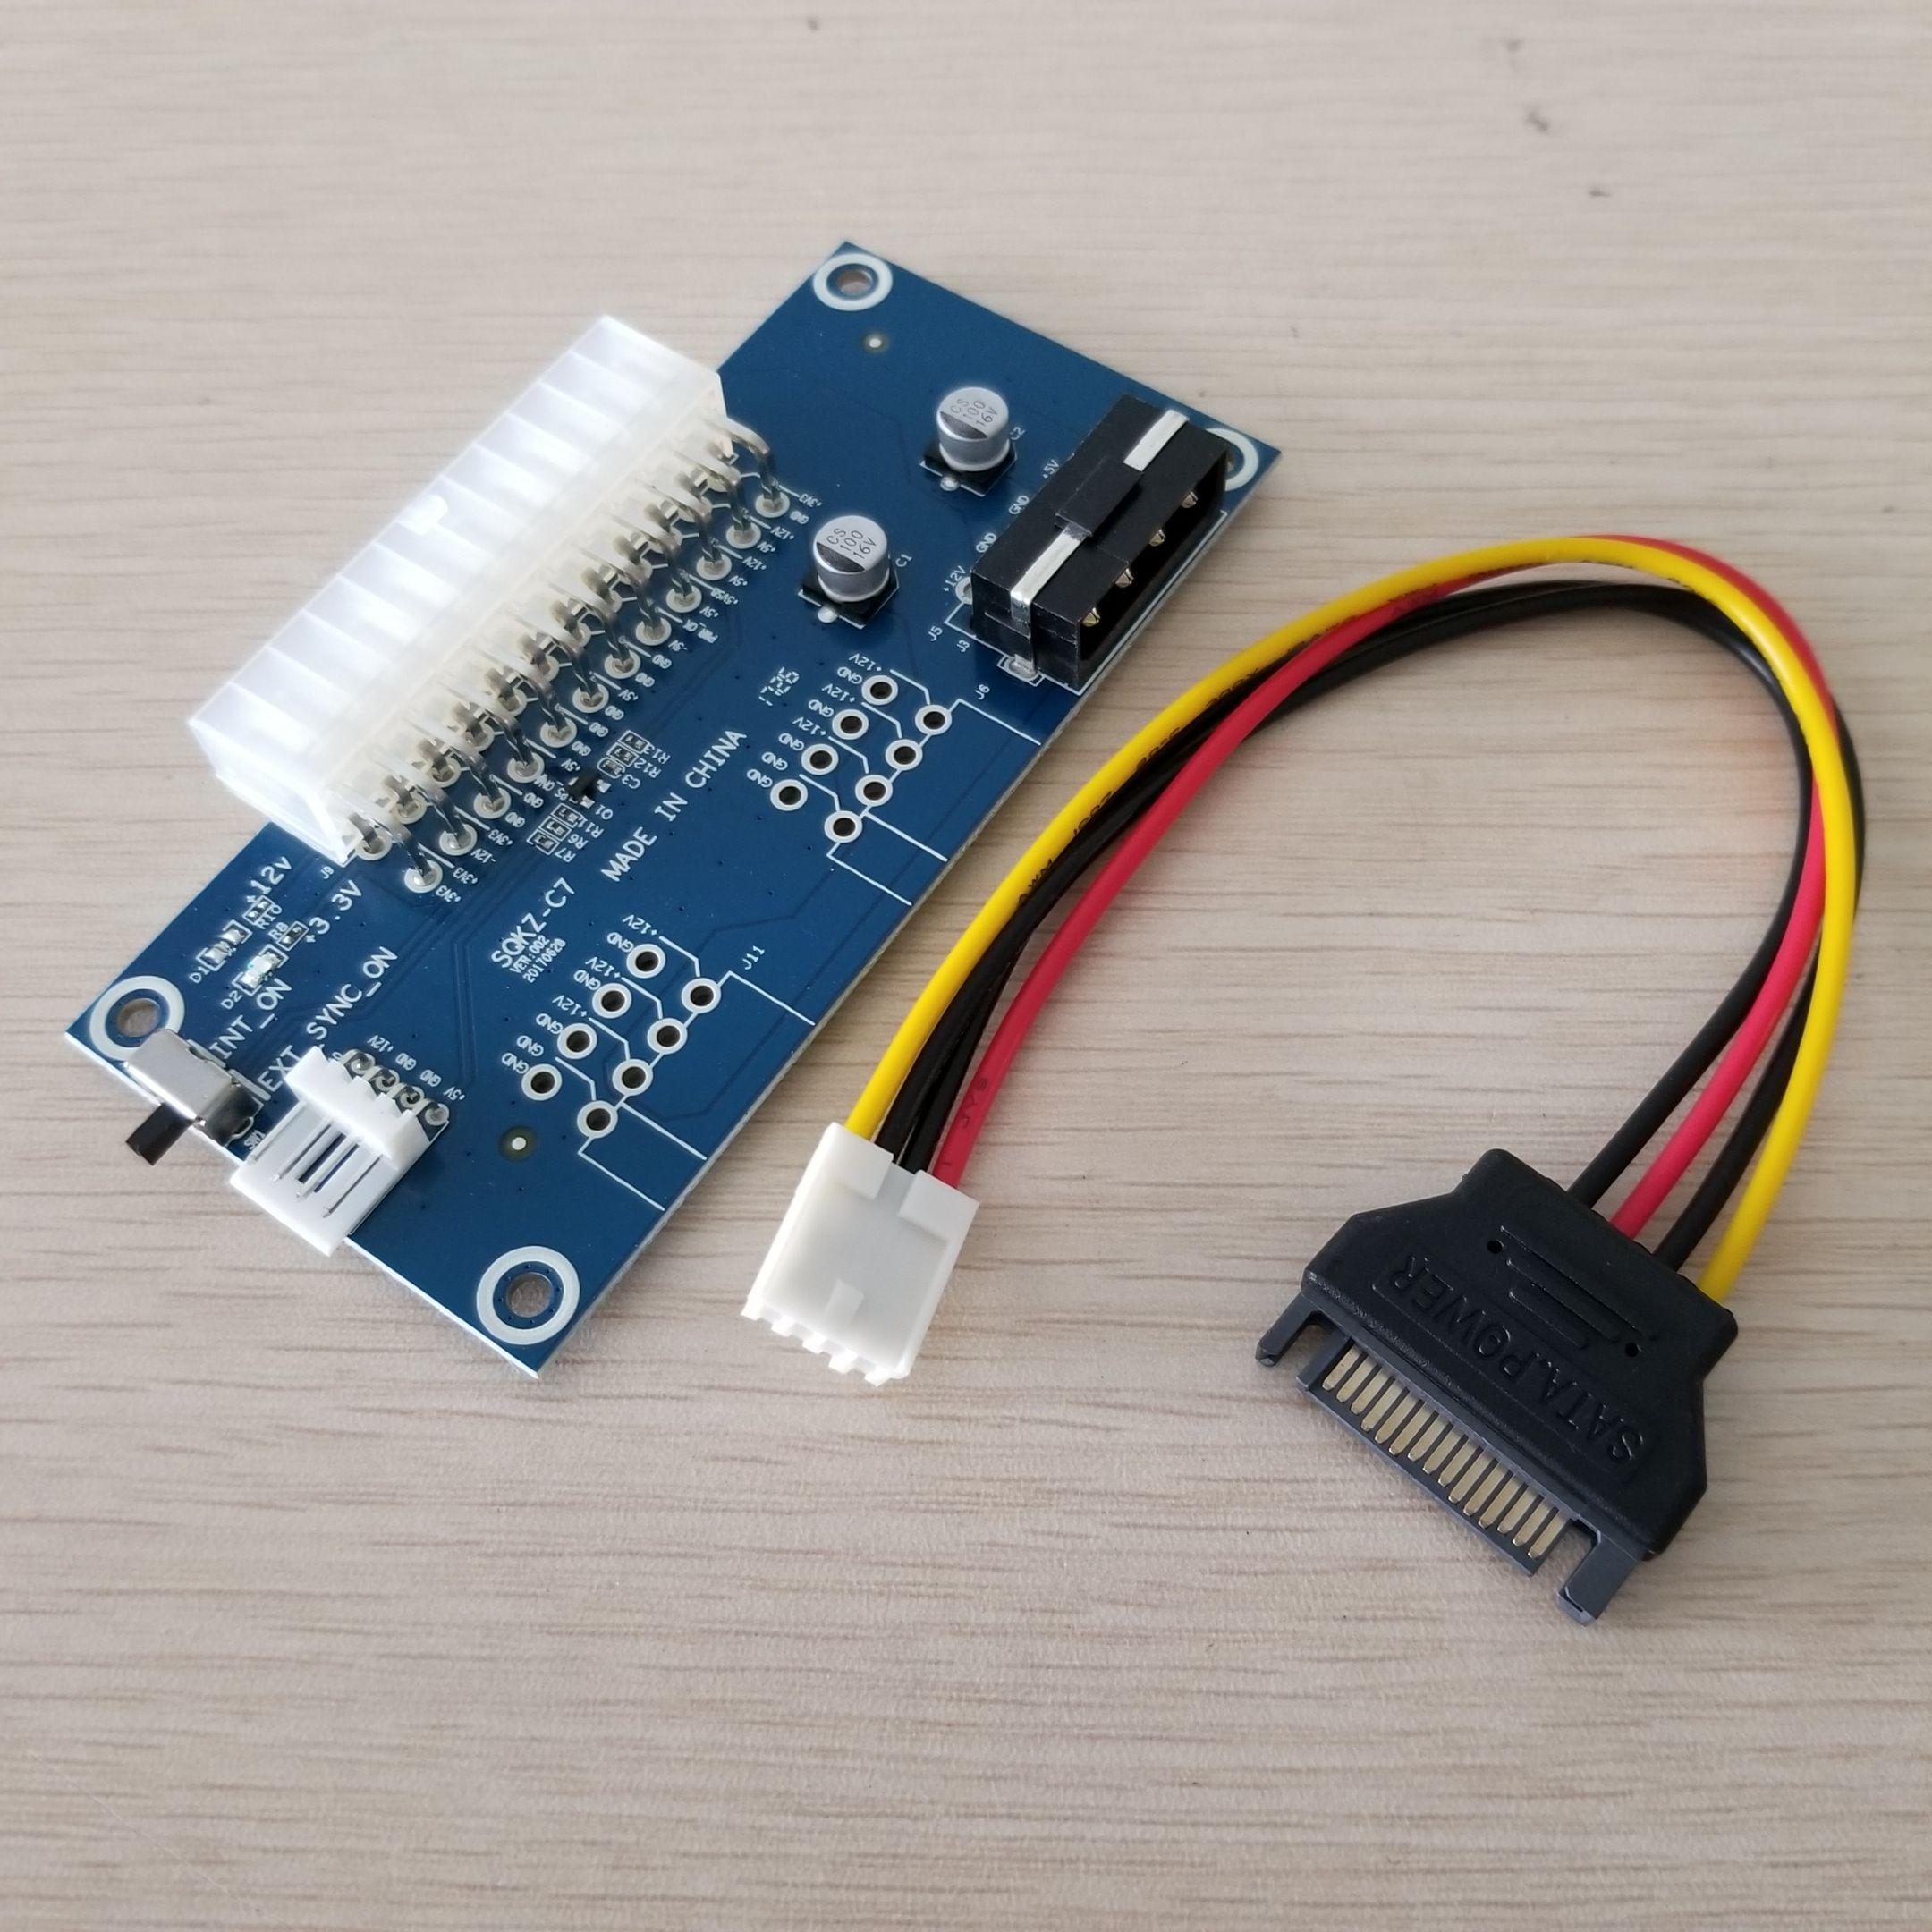 10 takım / grup PC Masaüstü ATX 24Pin Çift PSU Güç Kaynağı Sync Marş Extender Kablosu için Bitcoin Miner RIG DIY